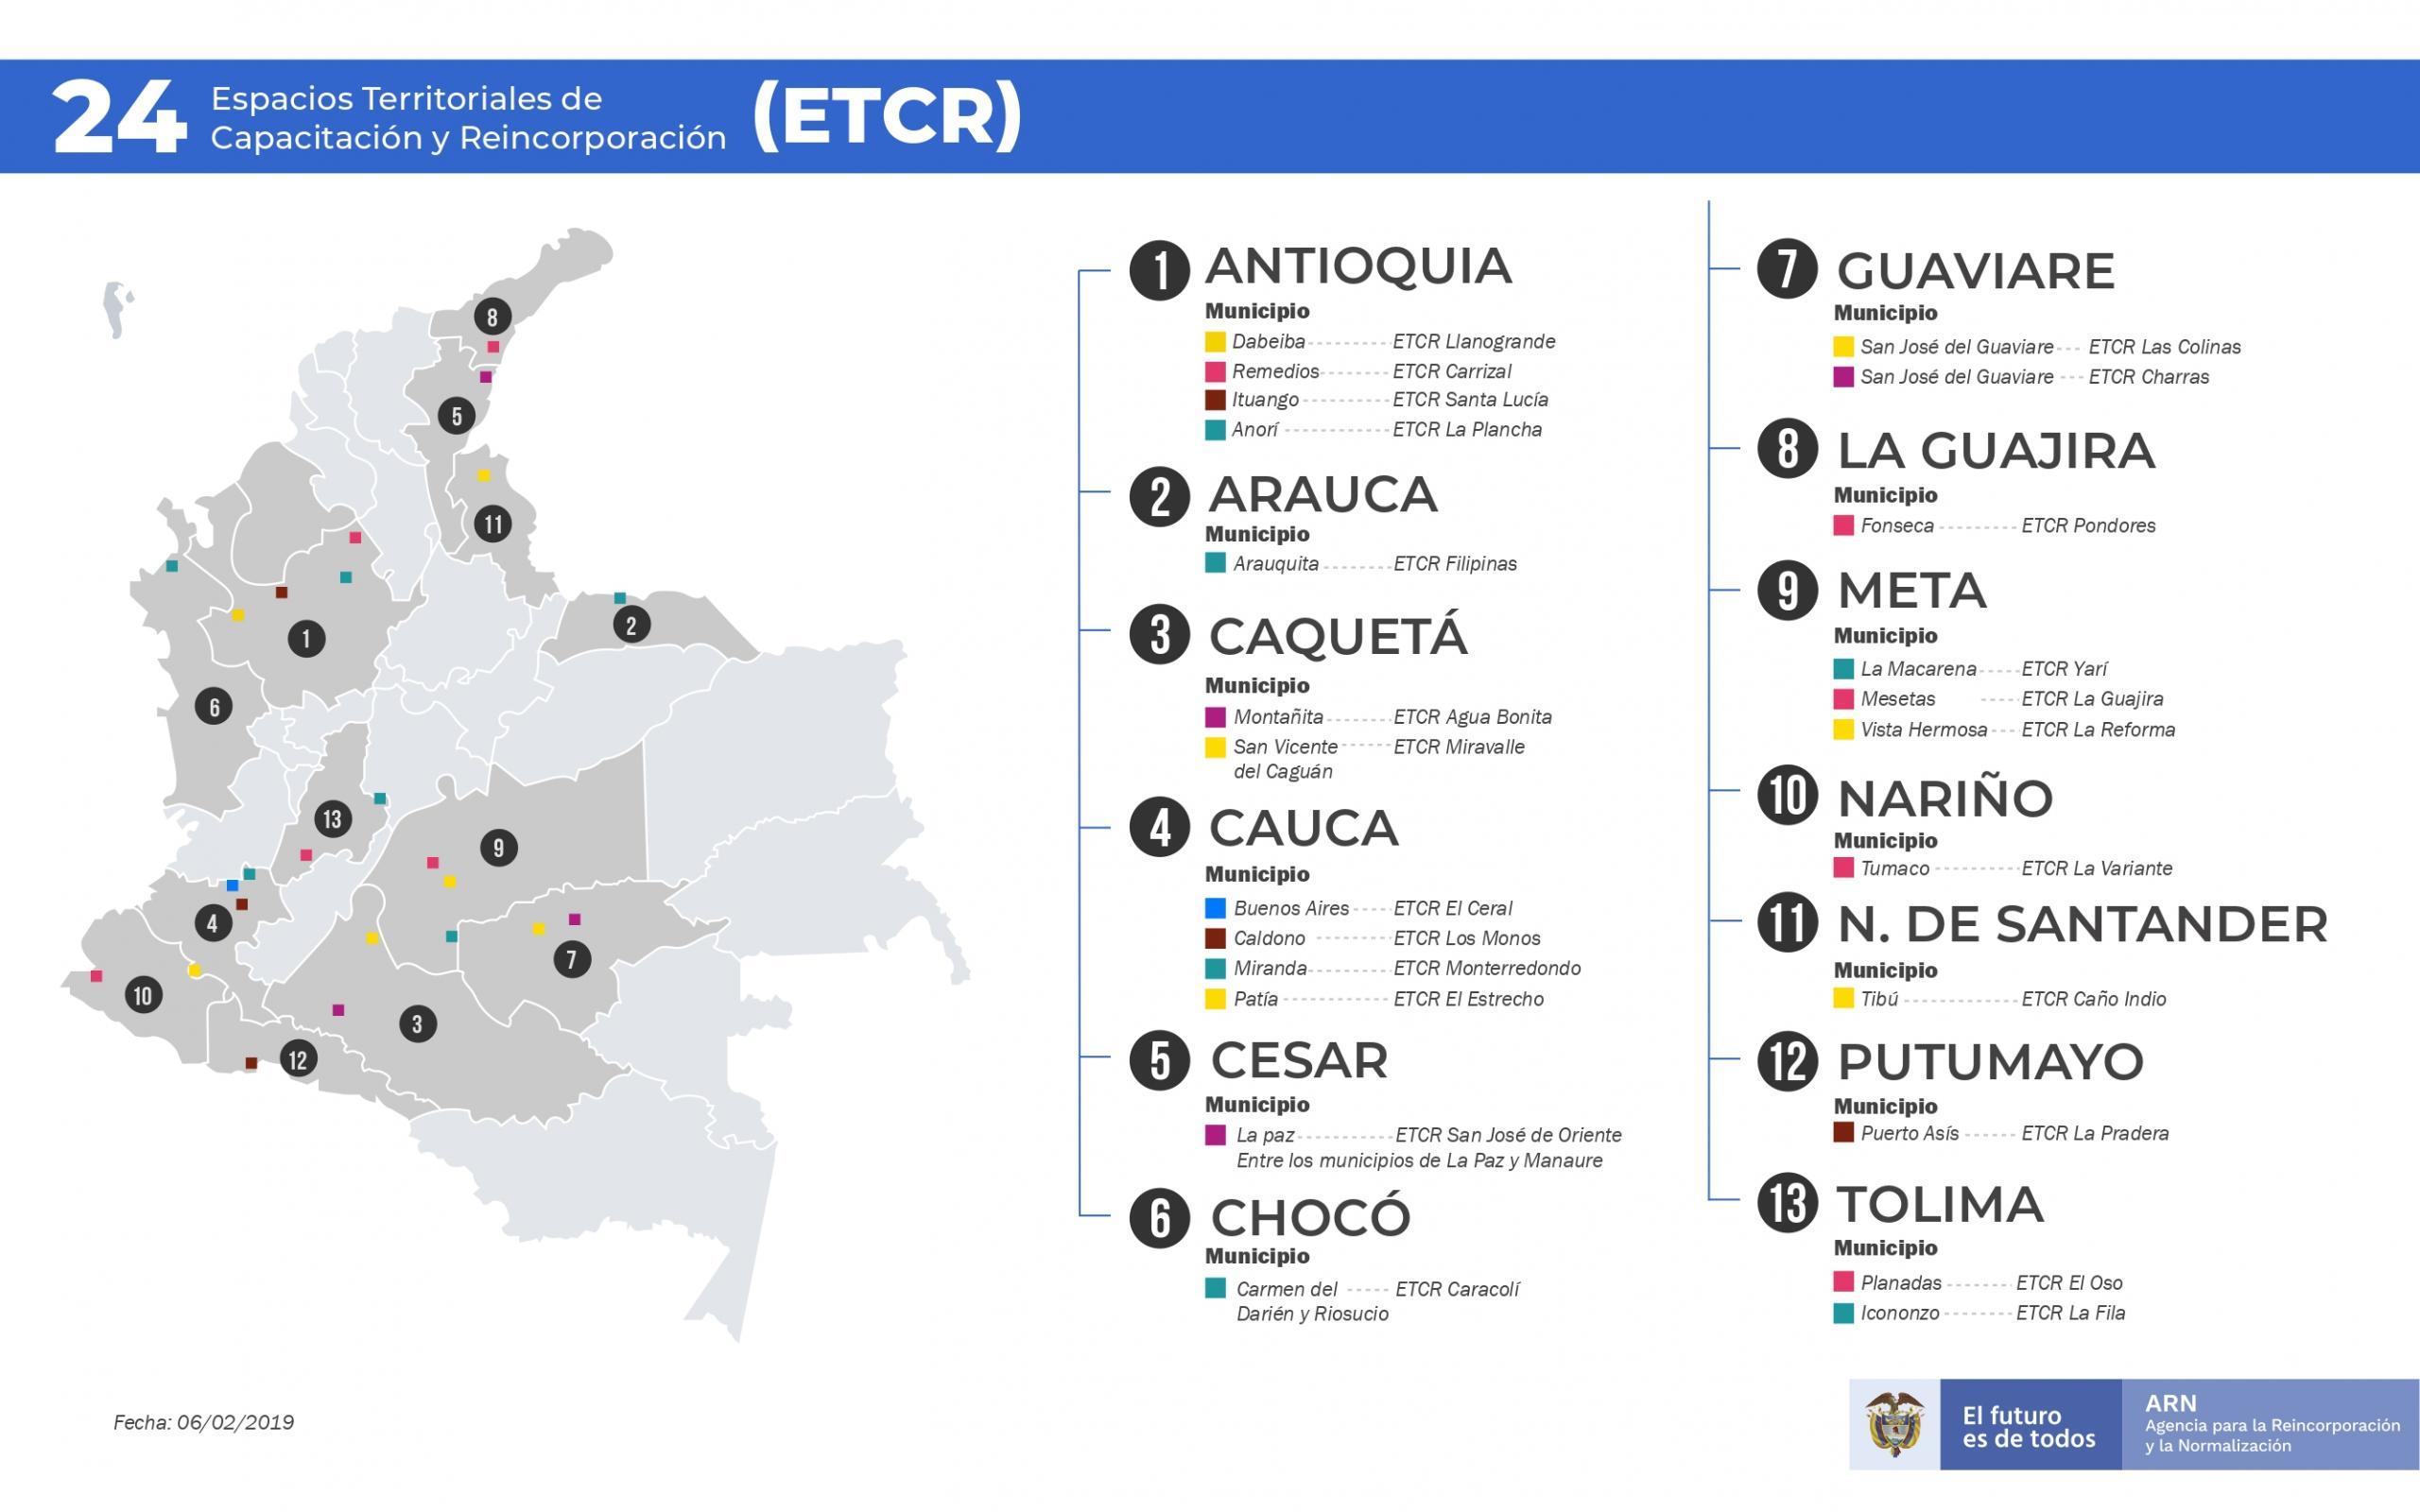 ECTR Colombia Corpi Civili Pace